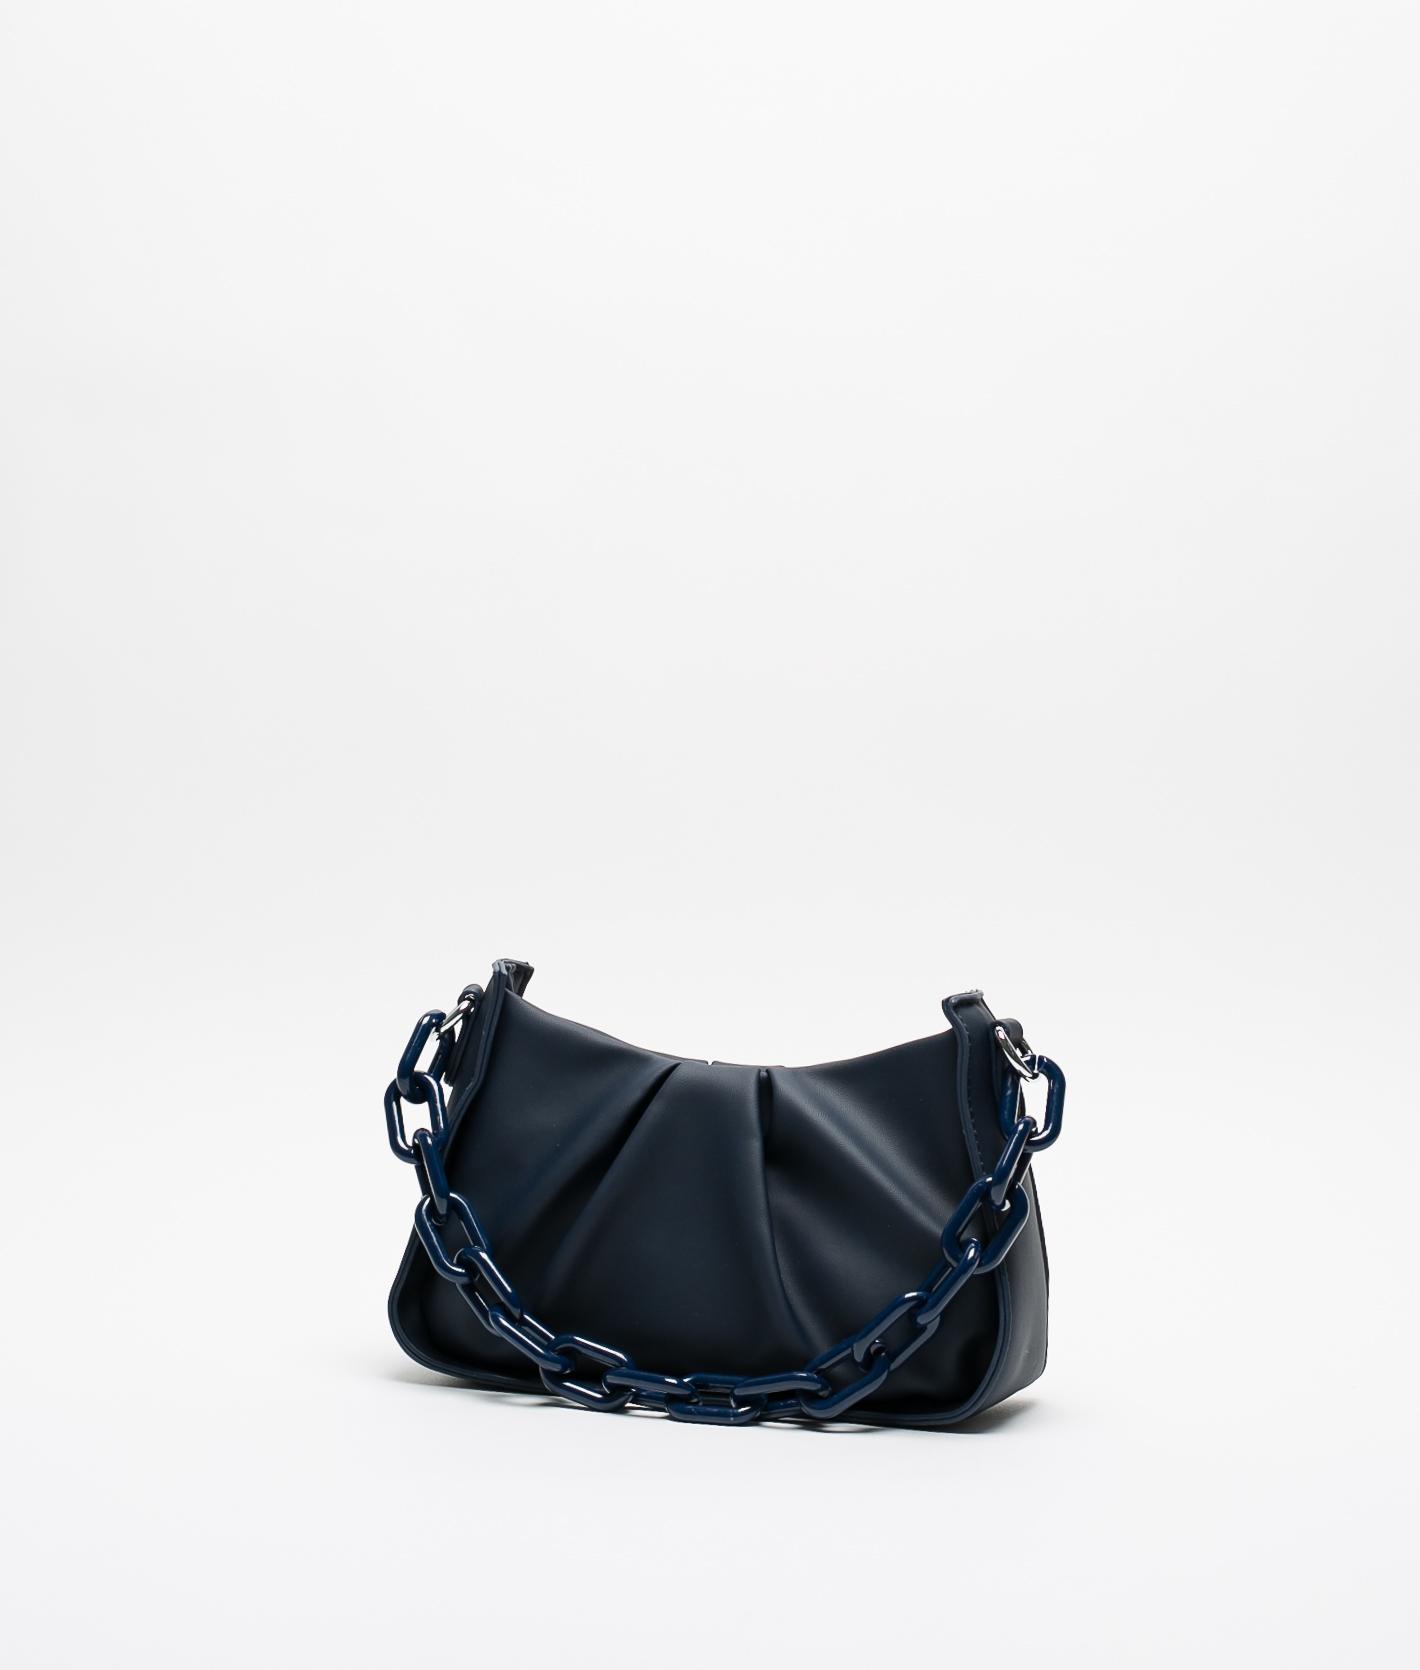 KEIN BAG - NAVY BLUE